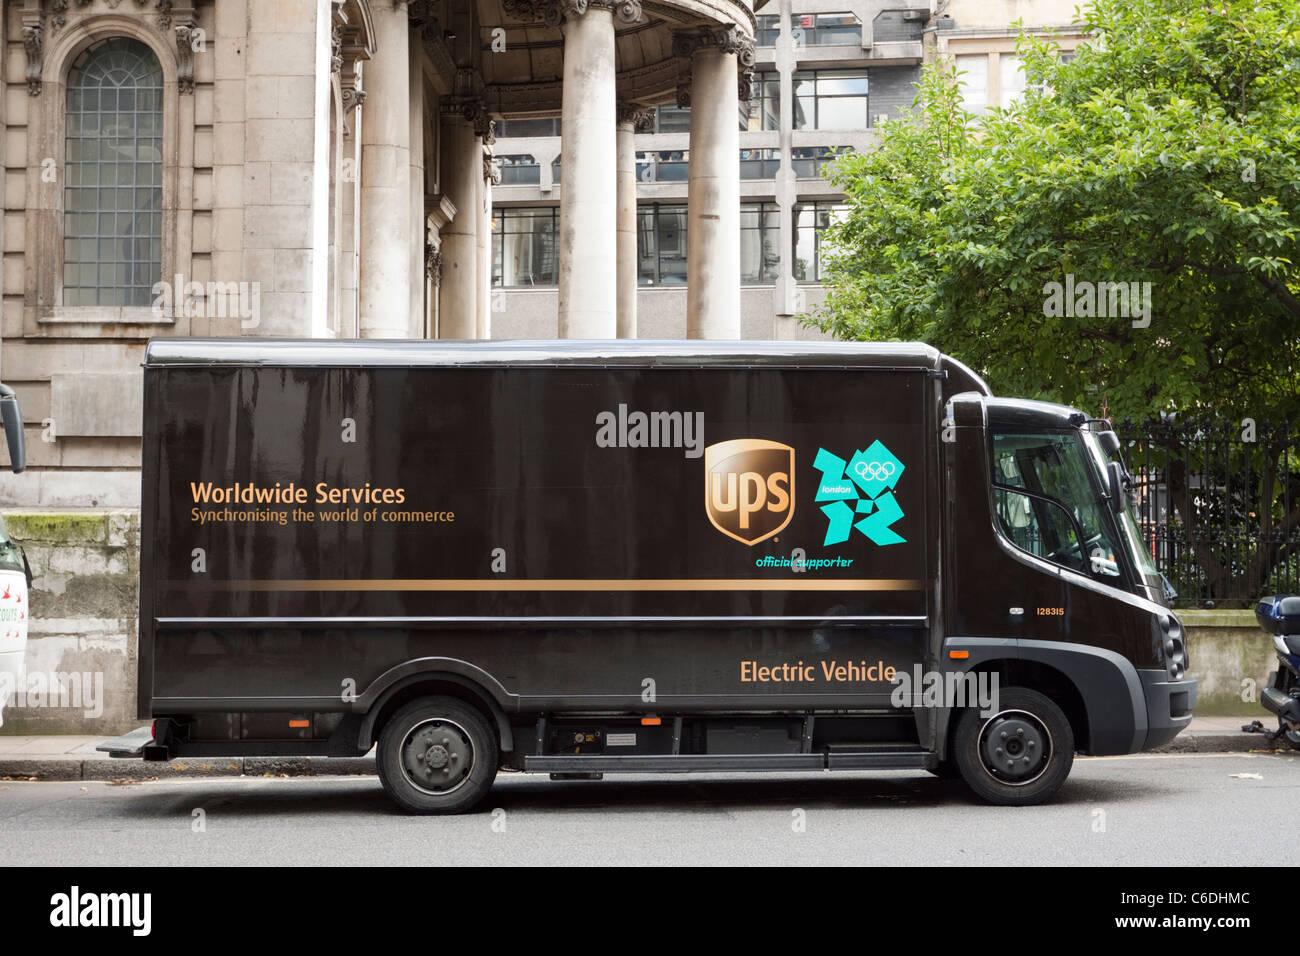 Camión de paquetería UPS, vehículo eléctrico, Londres, Inglaterra, Reino Unido. Imagen De Stock